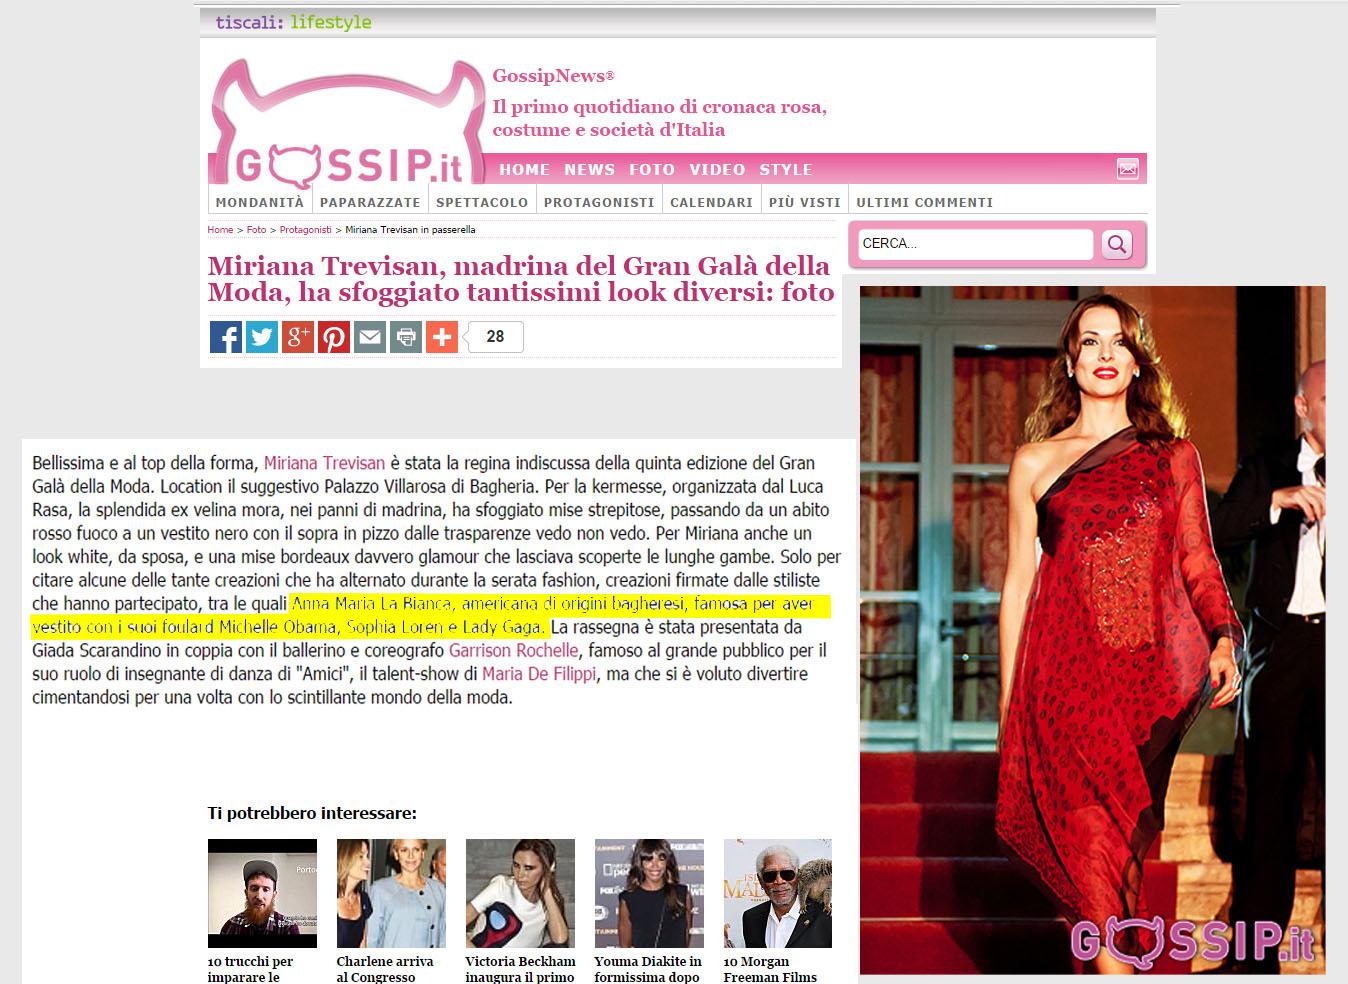 Sept 21 2014 VillaRosa Fashion Show Gossip.it 2.jpg